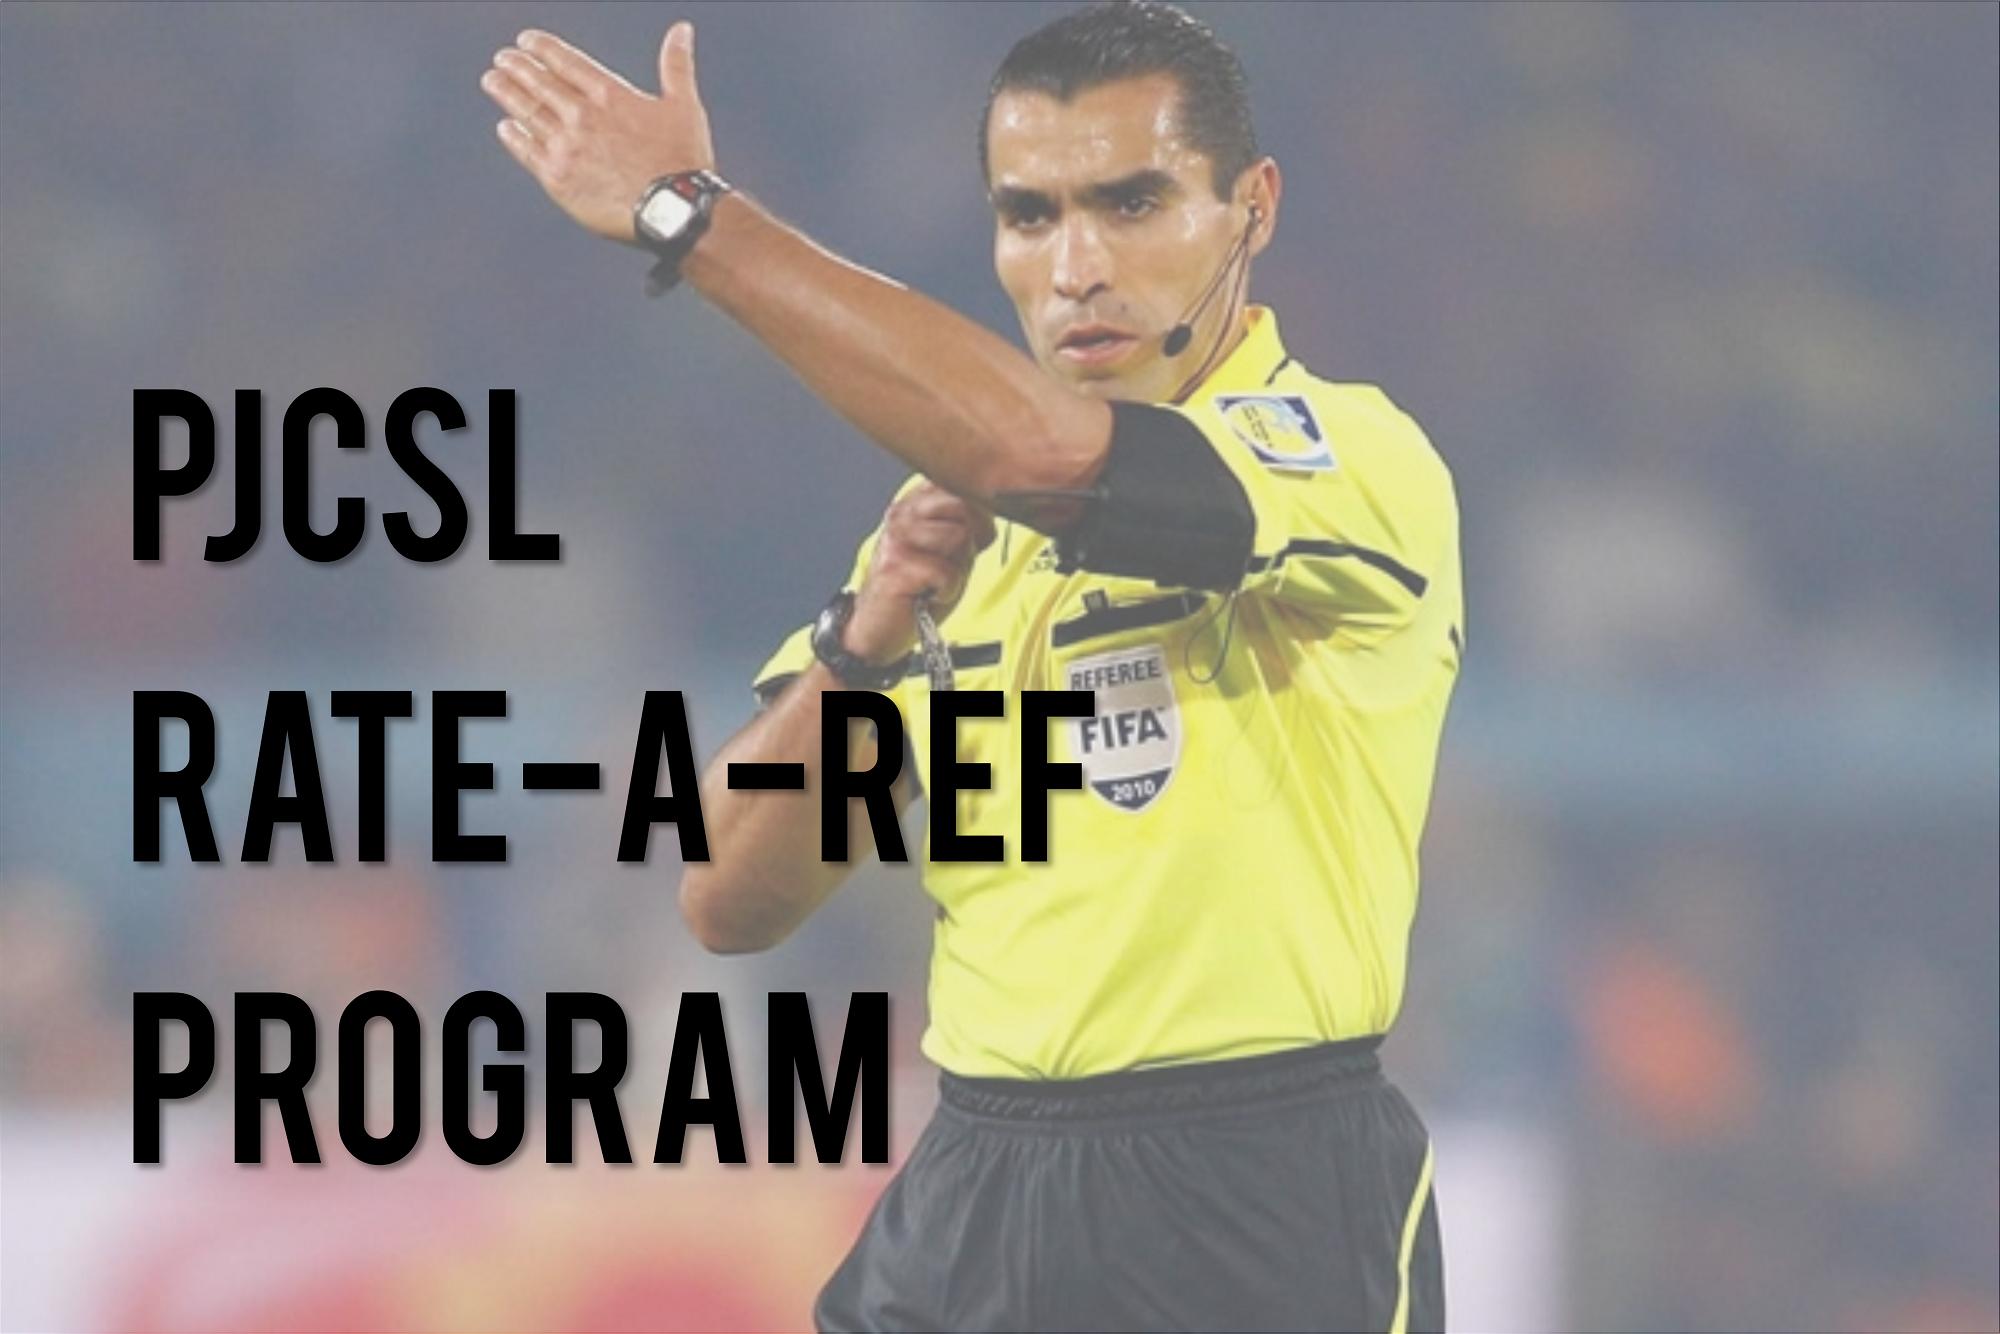 PCJSL Rate A Ref Program